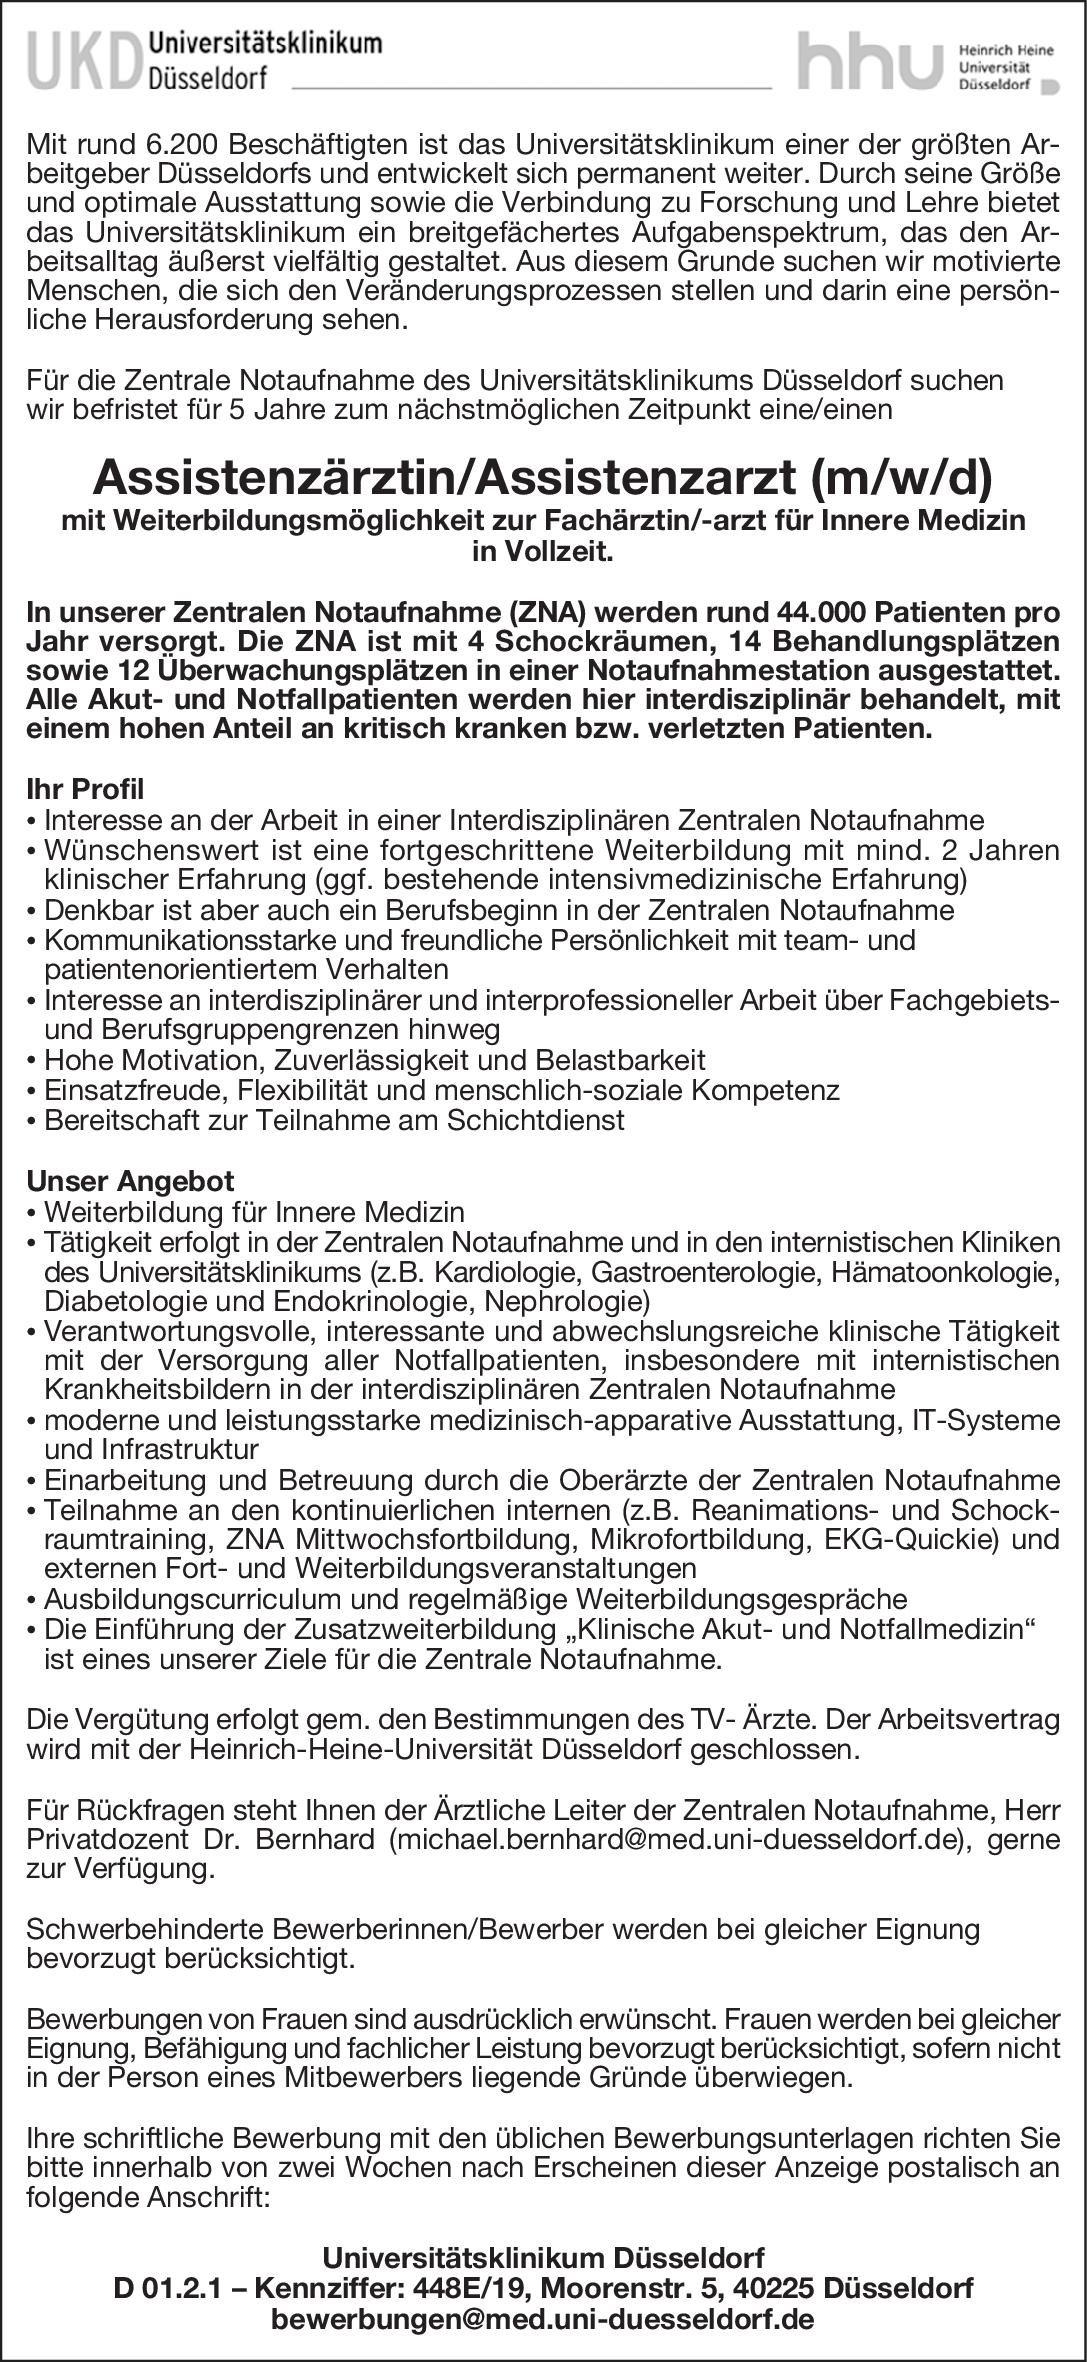 UKD Universitätsklinikum Düsseldorf Assistenzärztin/Assistenzarzt (m/w/d)  Innere Medizin, Innere Medizin Assistenzarzt / Arzt in Weiterbildung